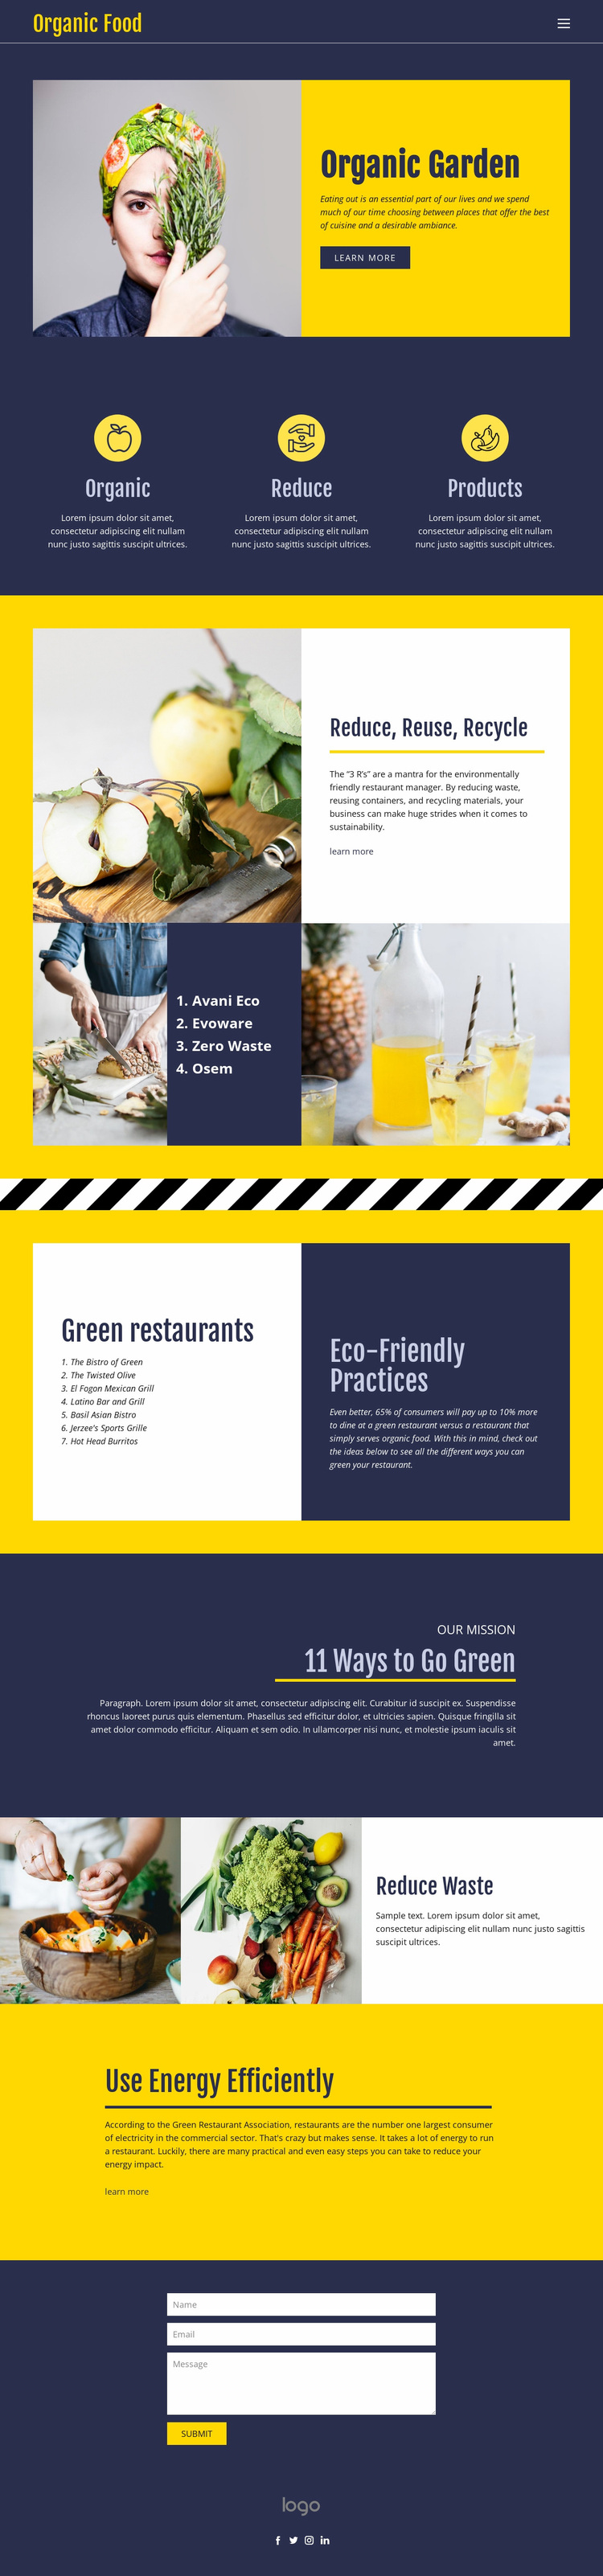 Organic Food Website Design